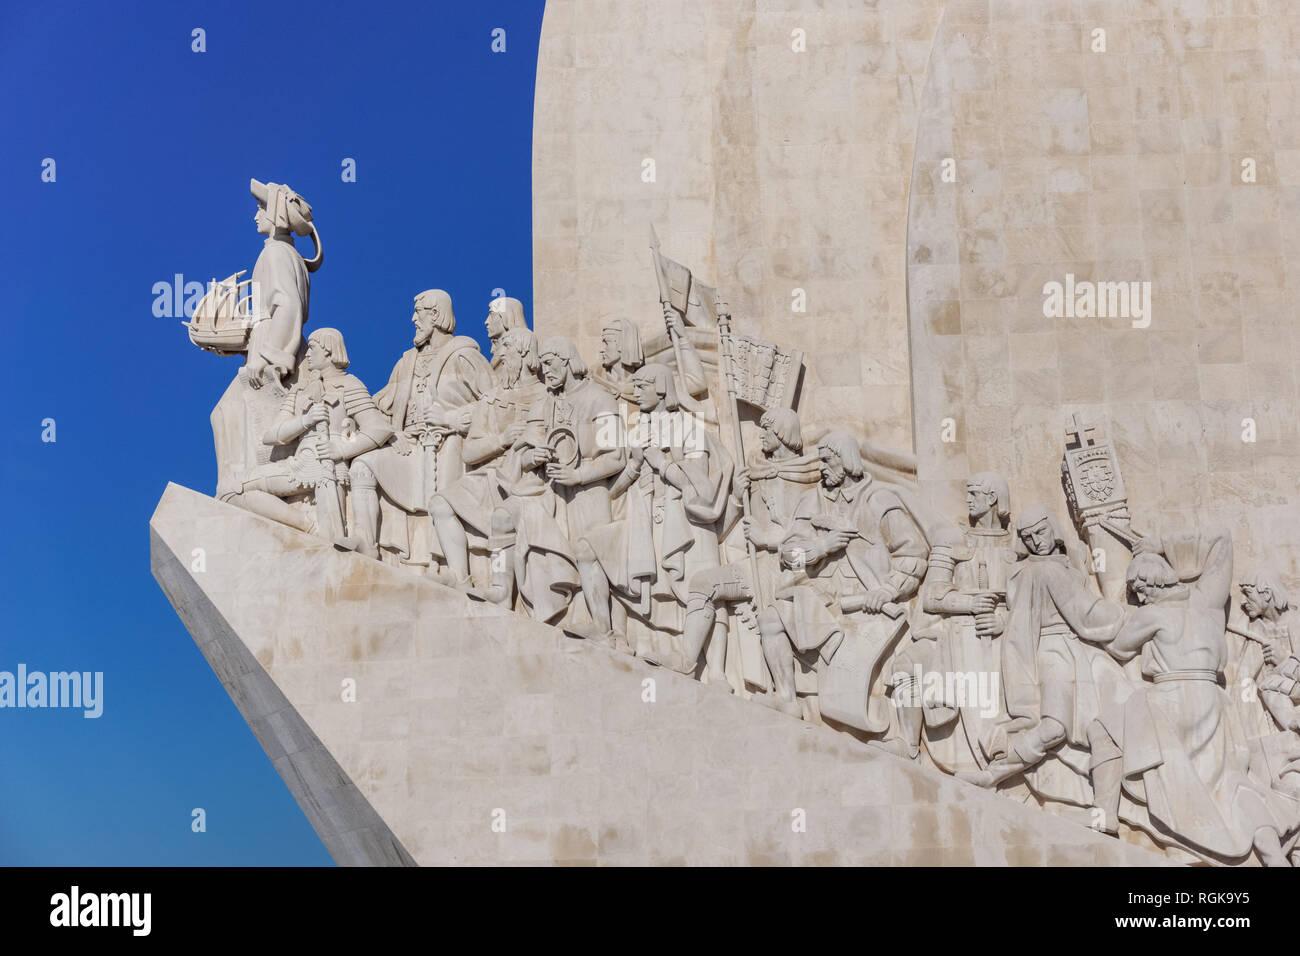 Monument to the Discoveries (Padrão dos Descobrimentos monument) in Lisbon, Portugal - Stock Image